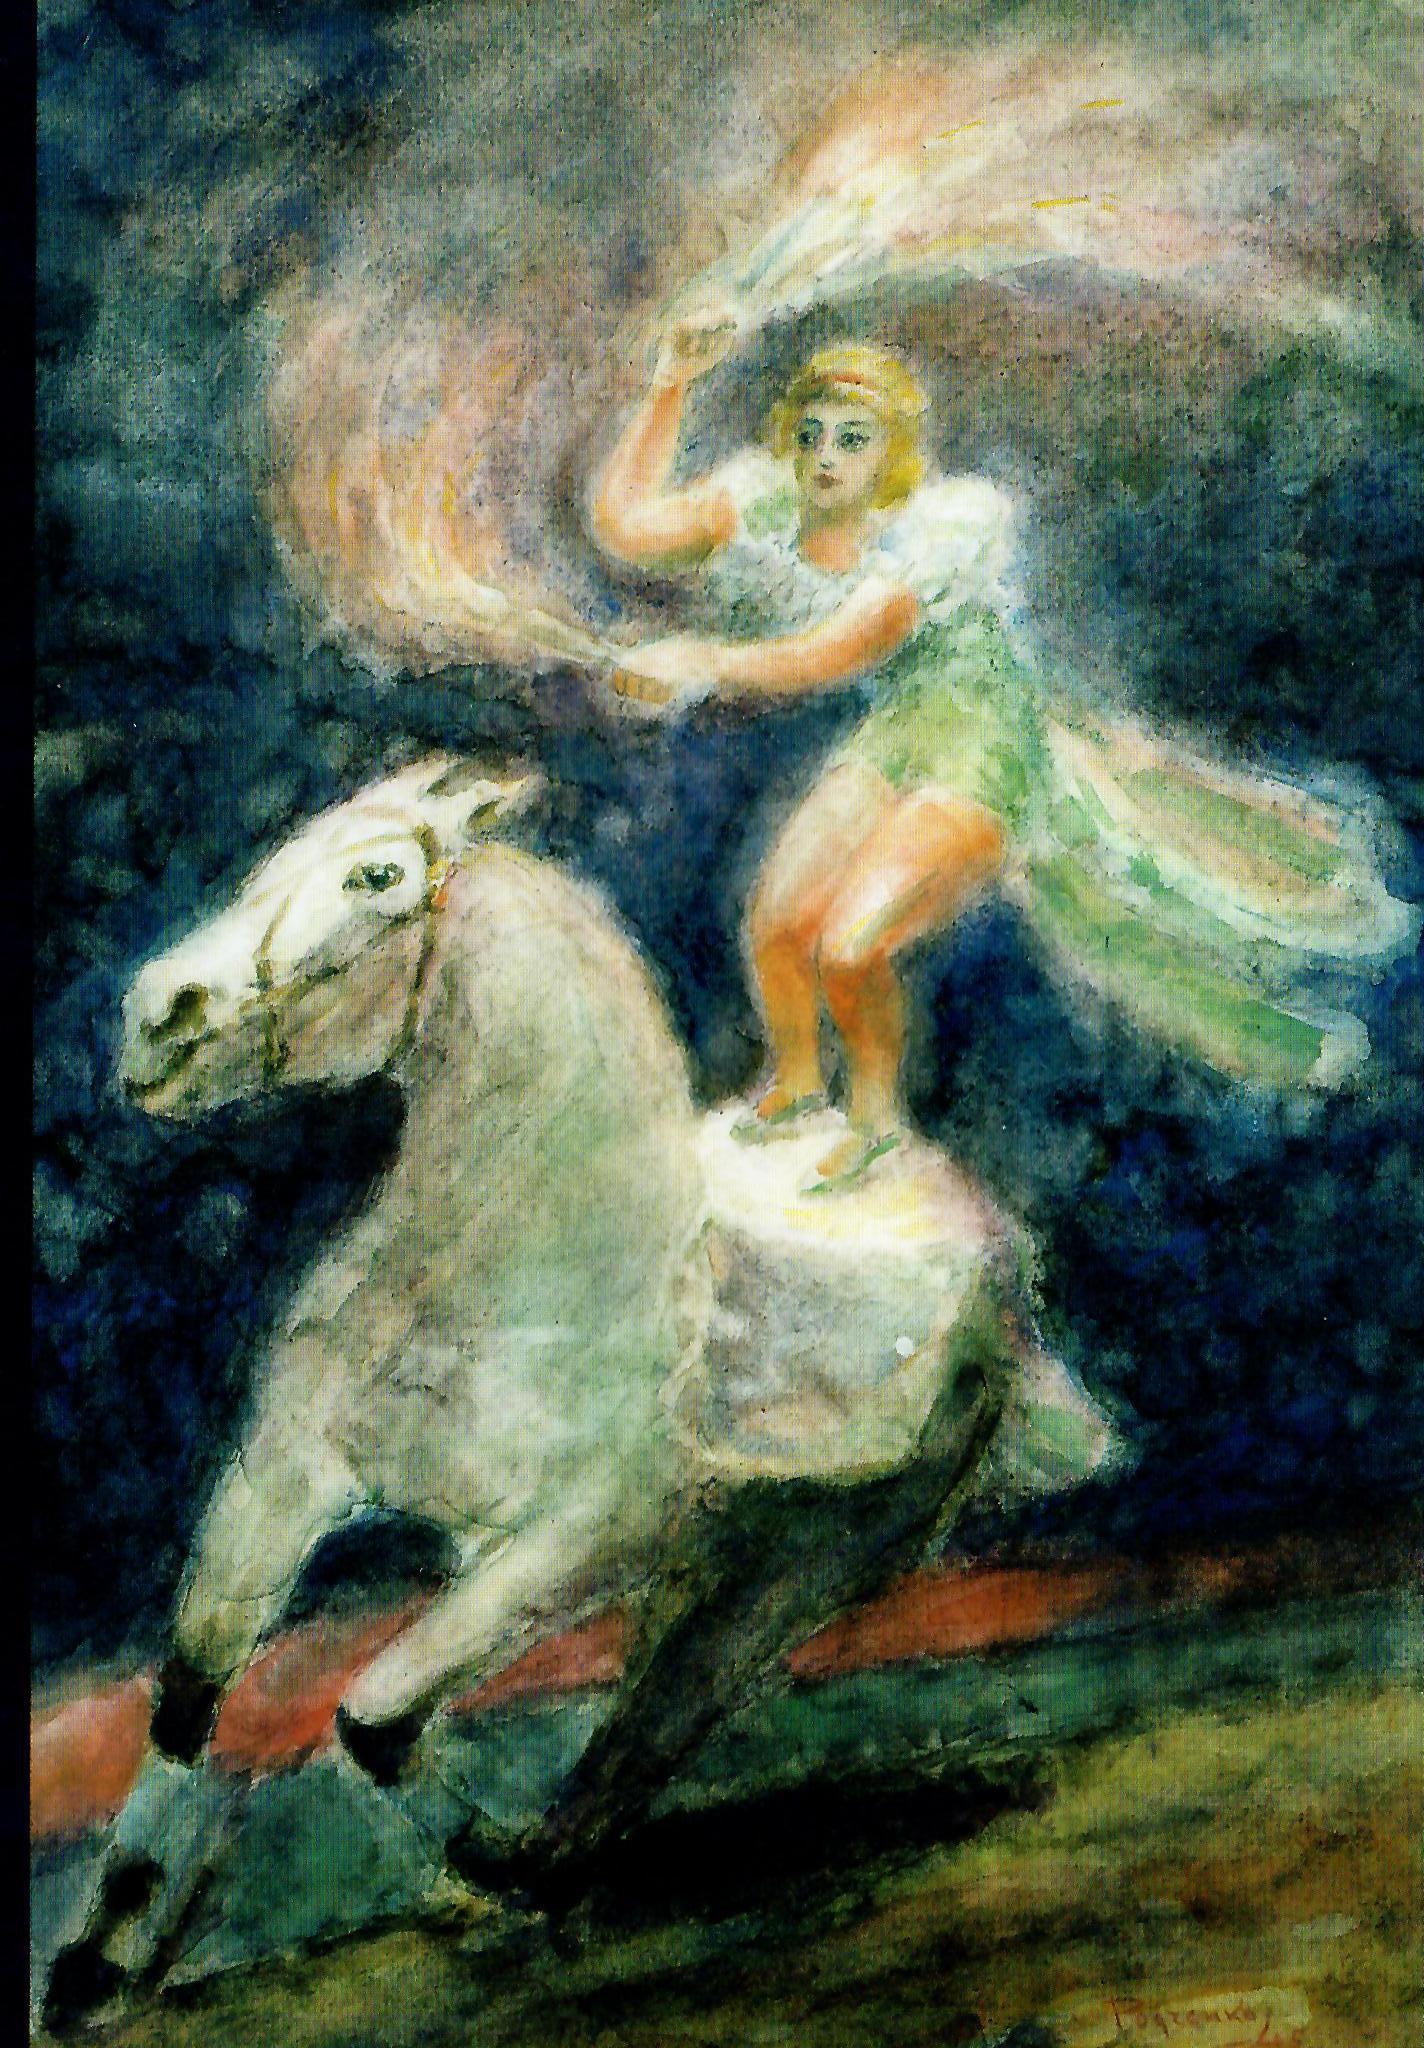 Horseback Rider, 1948 - Alexander Rodchenko